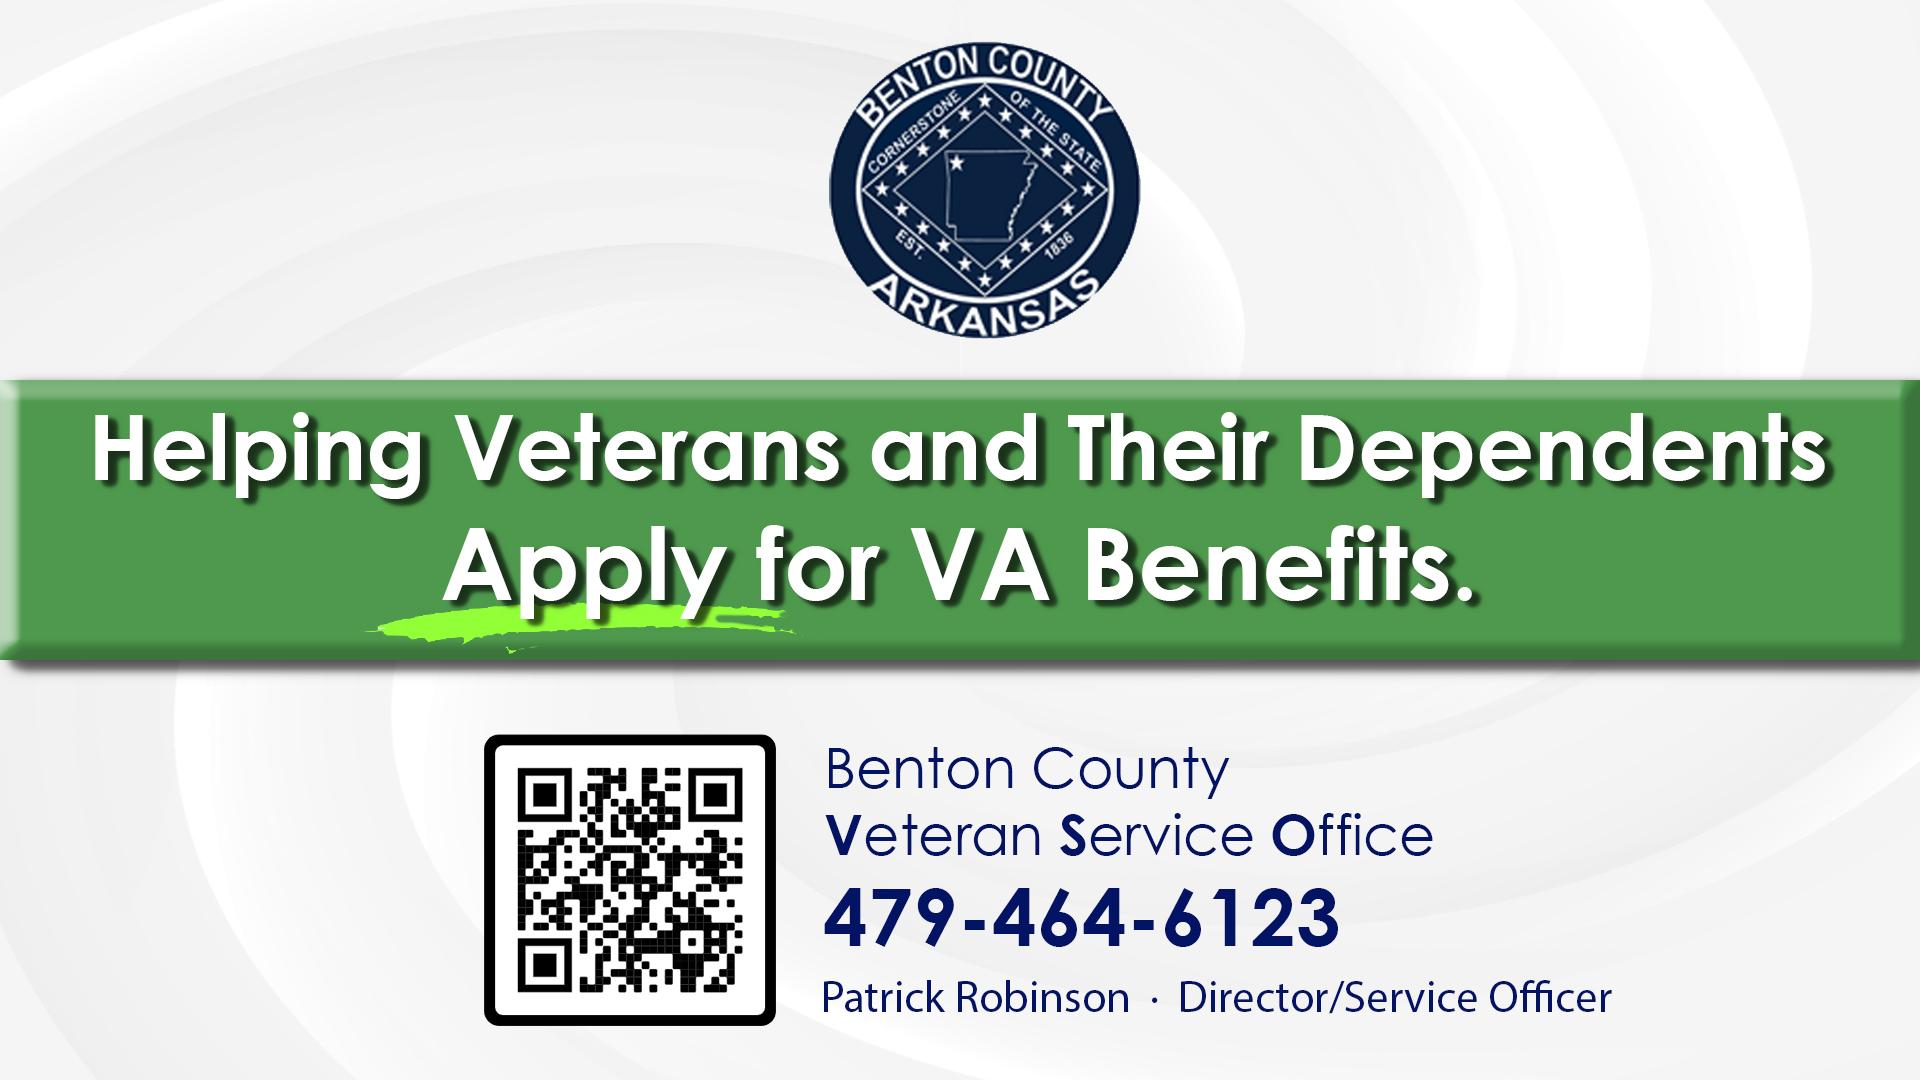 Veteran services - Benton